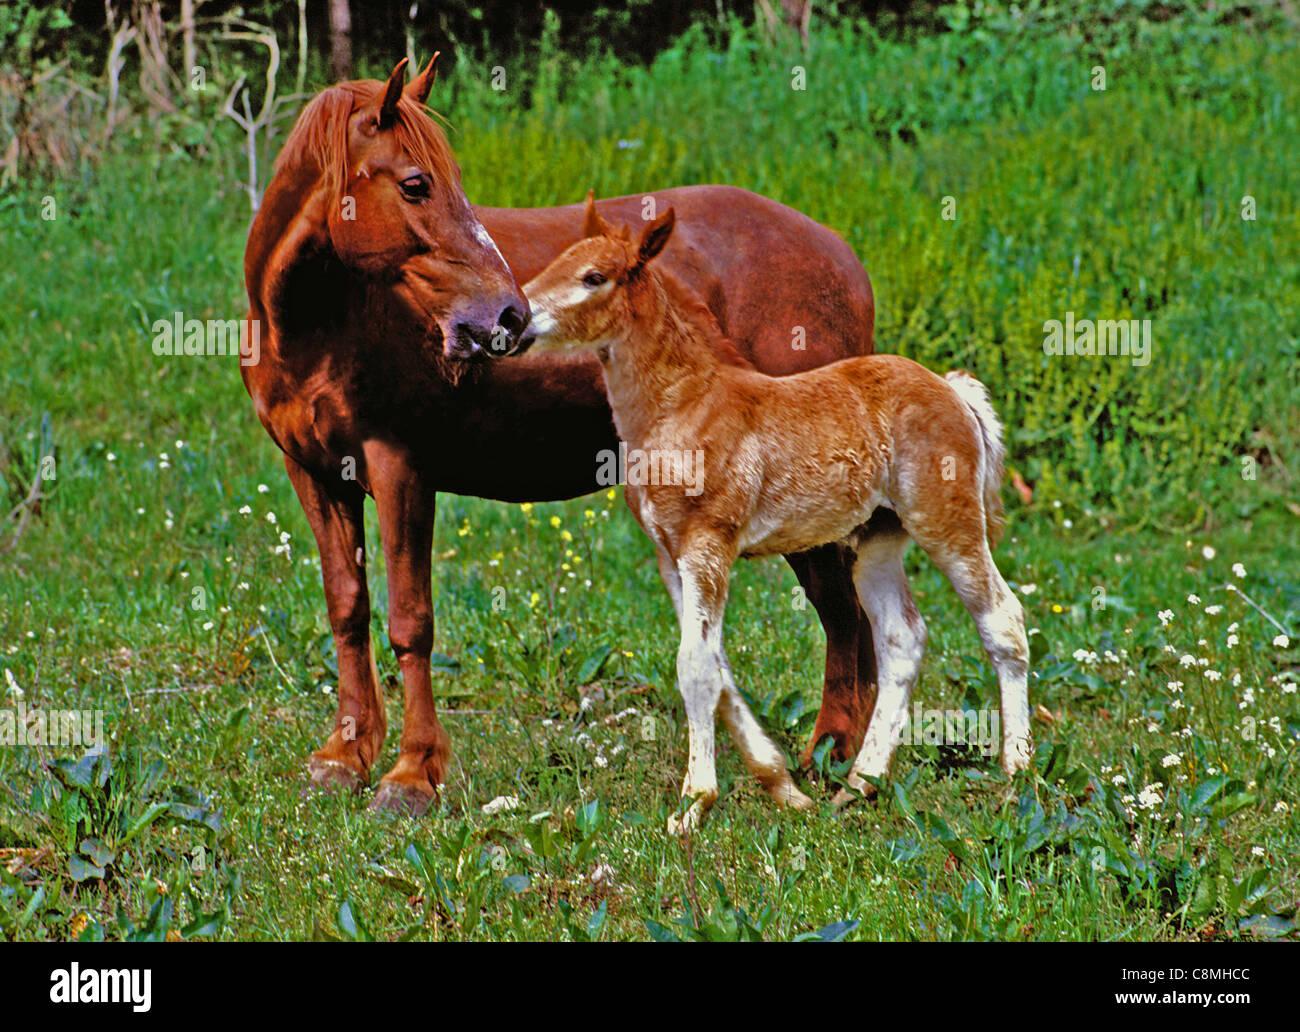 Maternity. - Stock Image